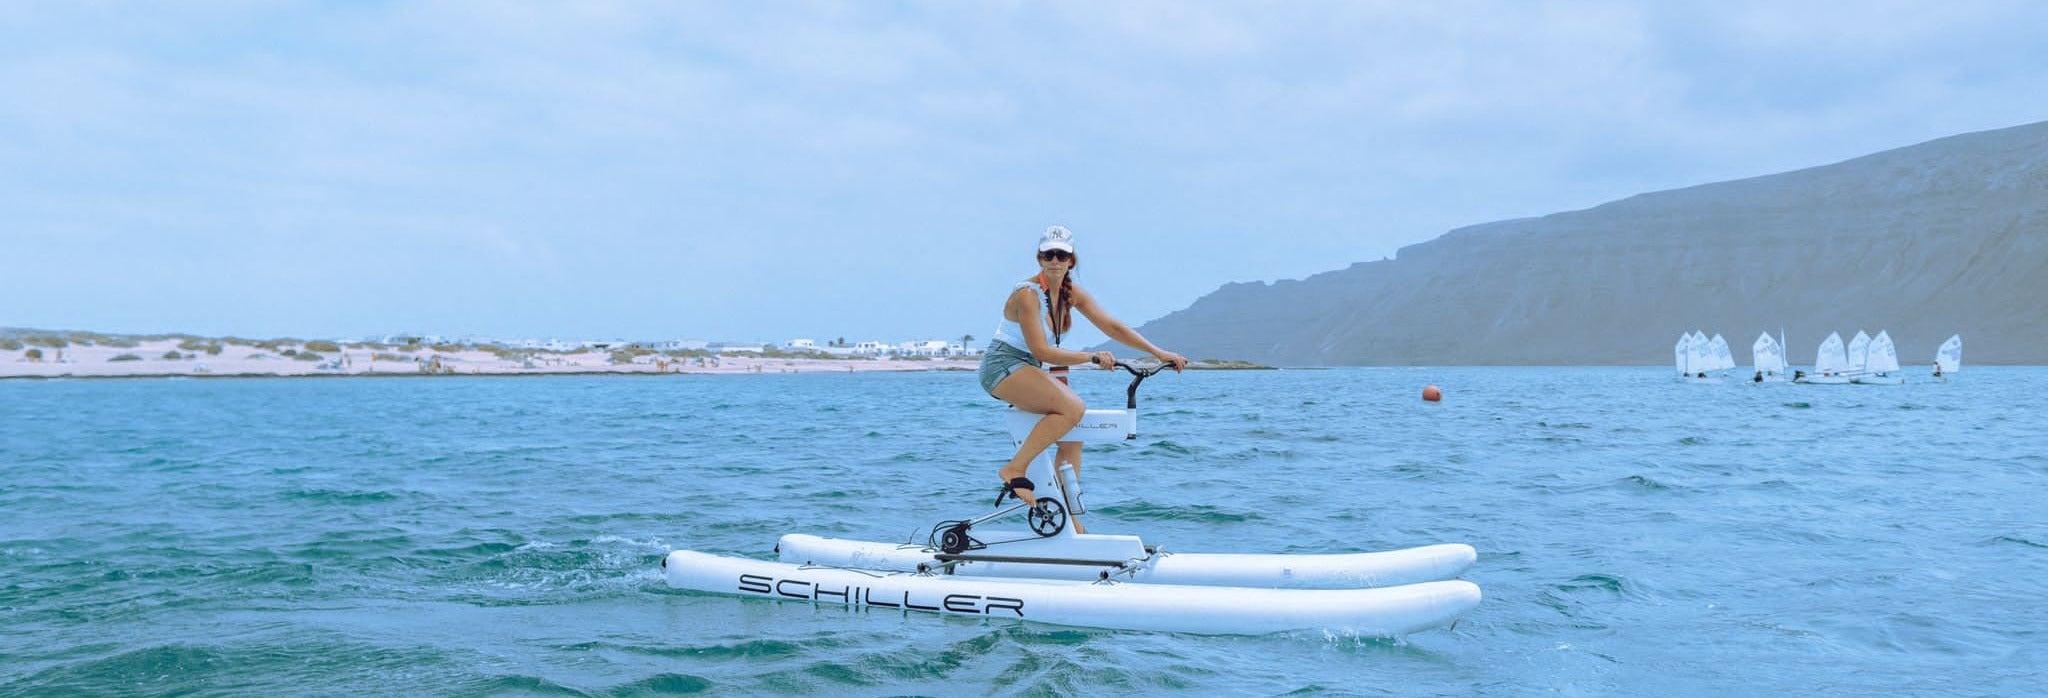 Tour en bicicleta acuática desde Playa Blanca